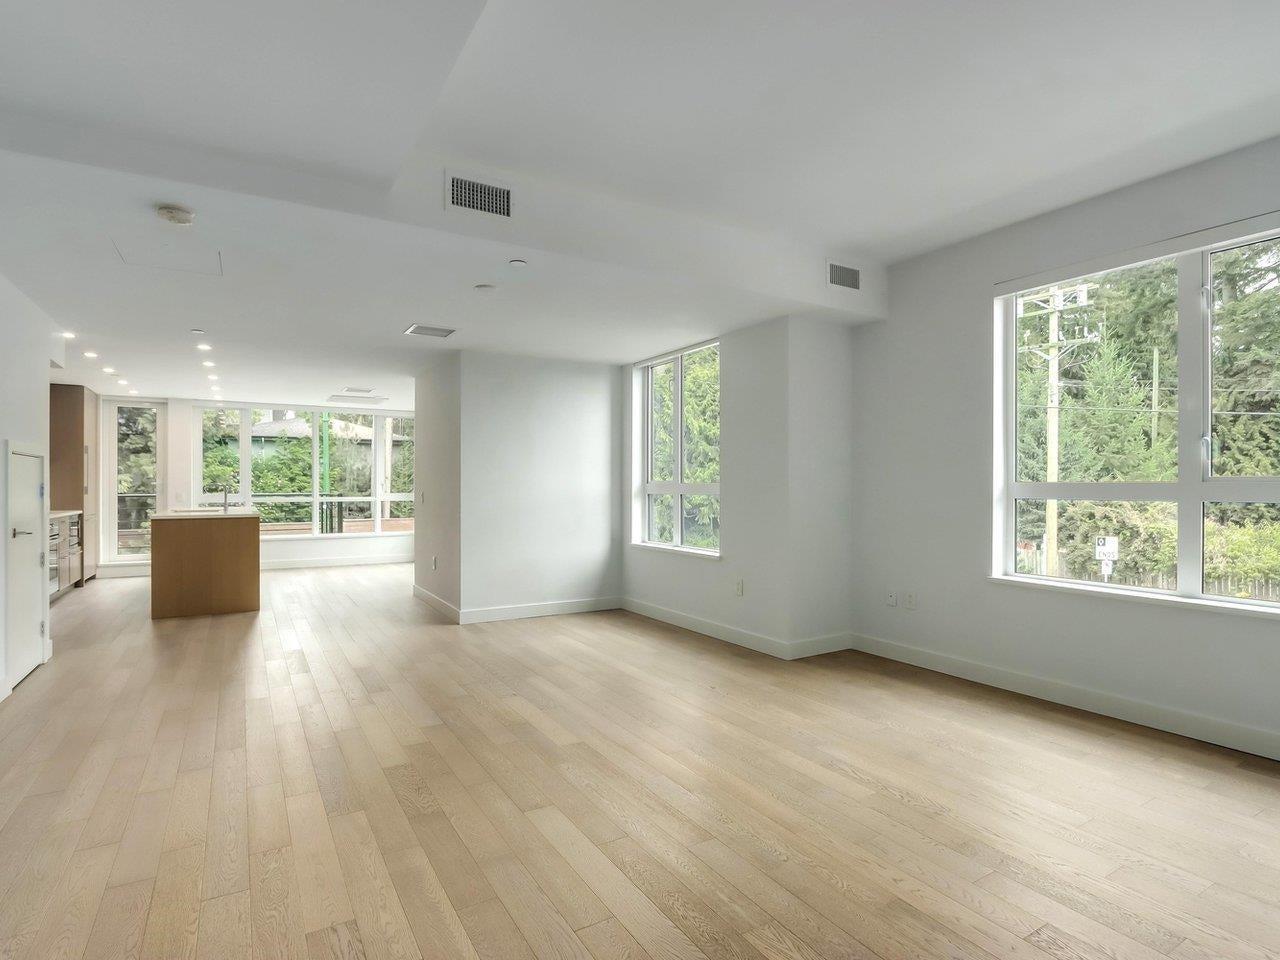 202 1055 RIDGEWOOD DRIVE - Edgemont Townhouse for sale, 3 Bedrooms (R2611487) - #4